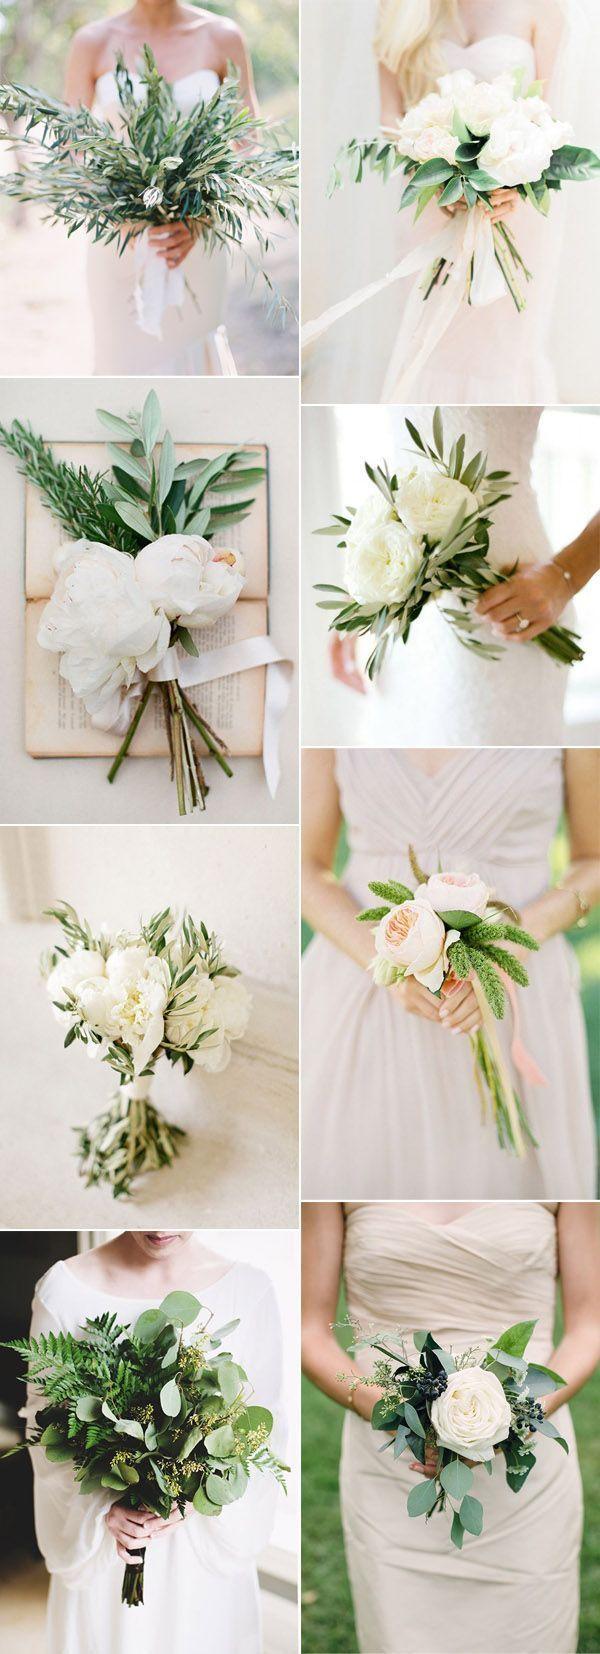 best floral ideas images on pinterest wedding bouquets